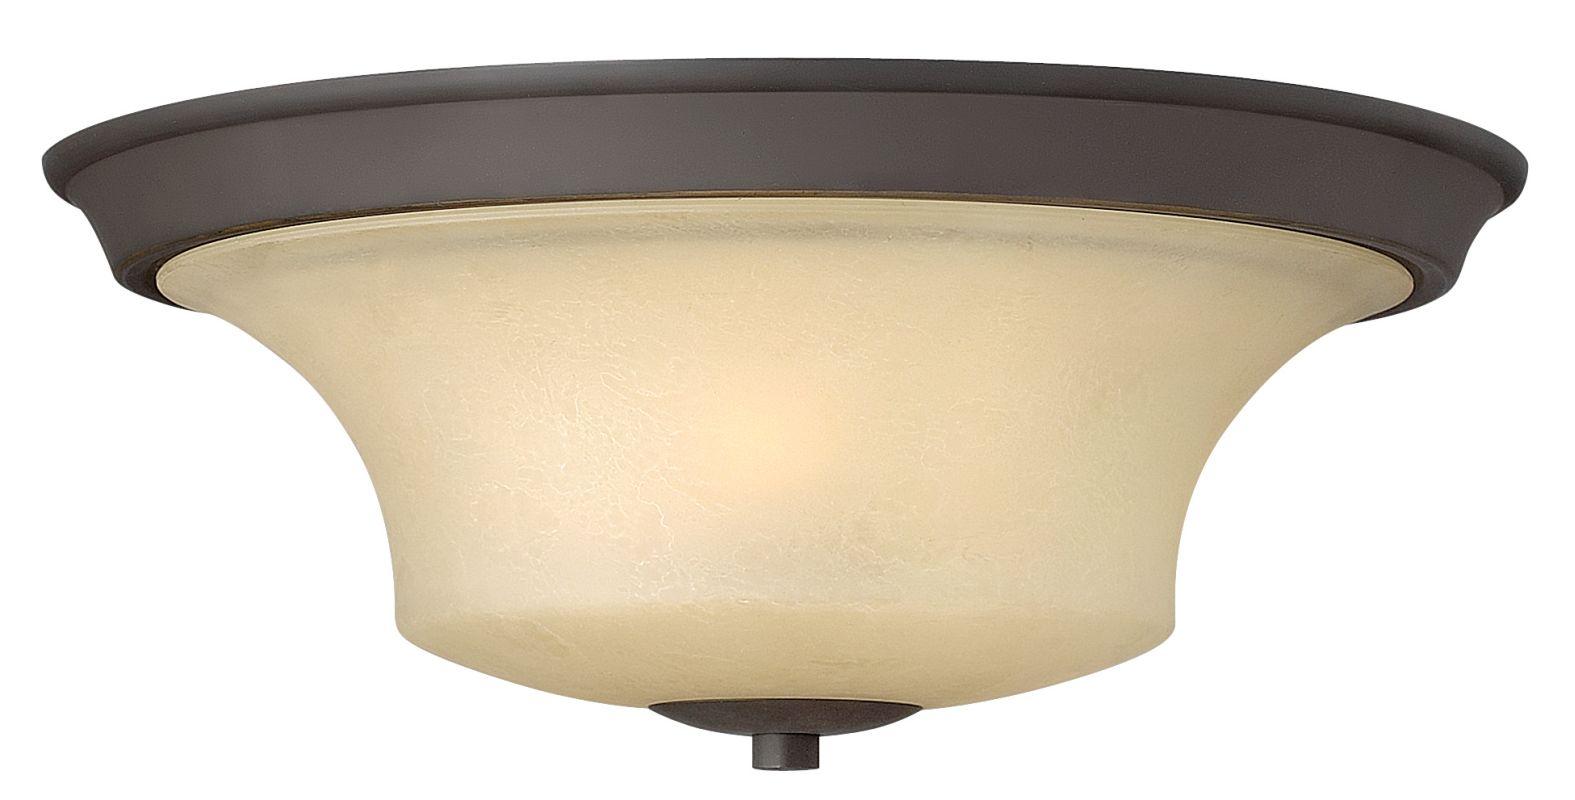 Hinkley Lighting 4631 3 Light Indoor Flush Mount Ceiling Fixture from Sale $159.00 ITEM: bci1706337 ID#:4631OZ UPC: 640665463118 :